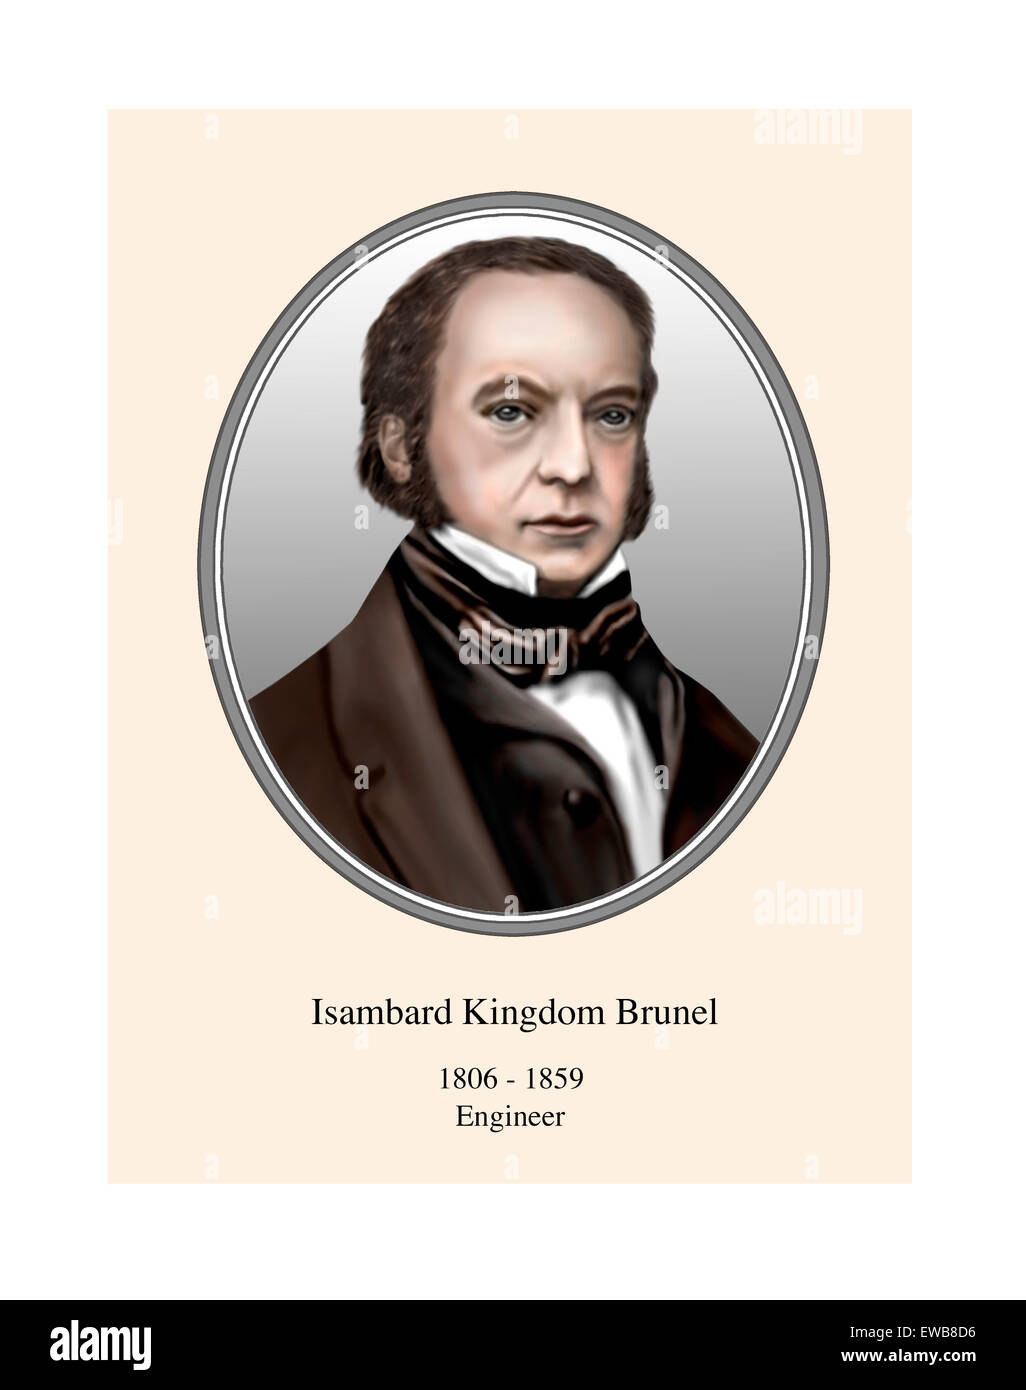 Isambard Kingdom Brunel Portrait Modern Illustration - Stock Image